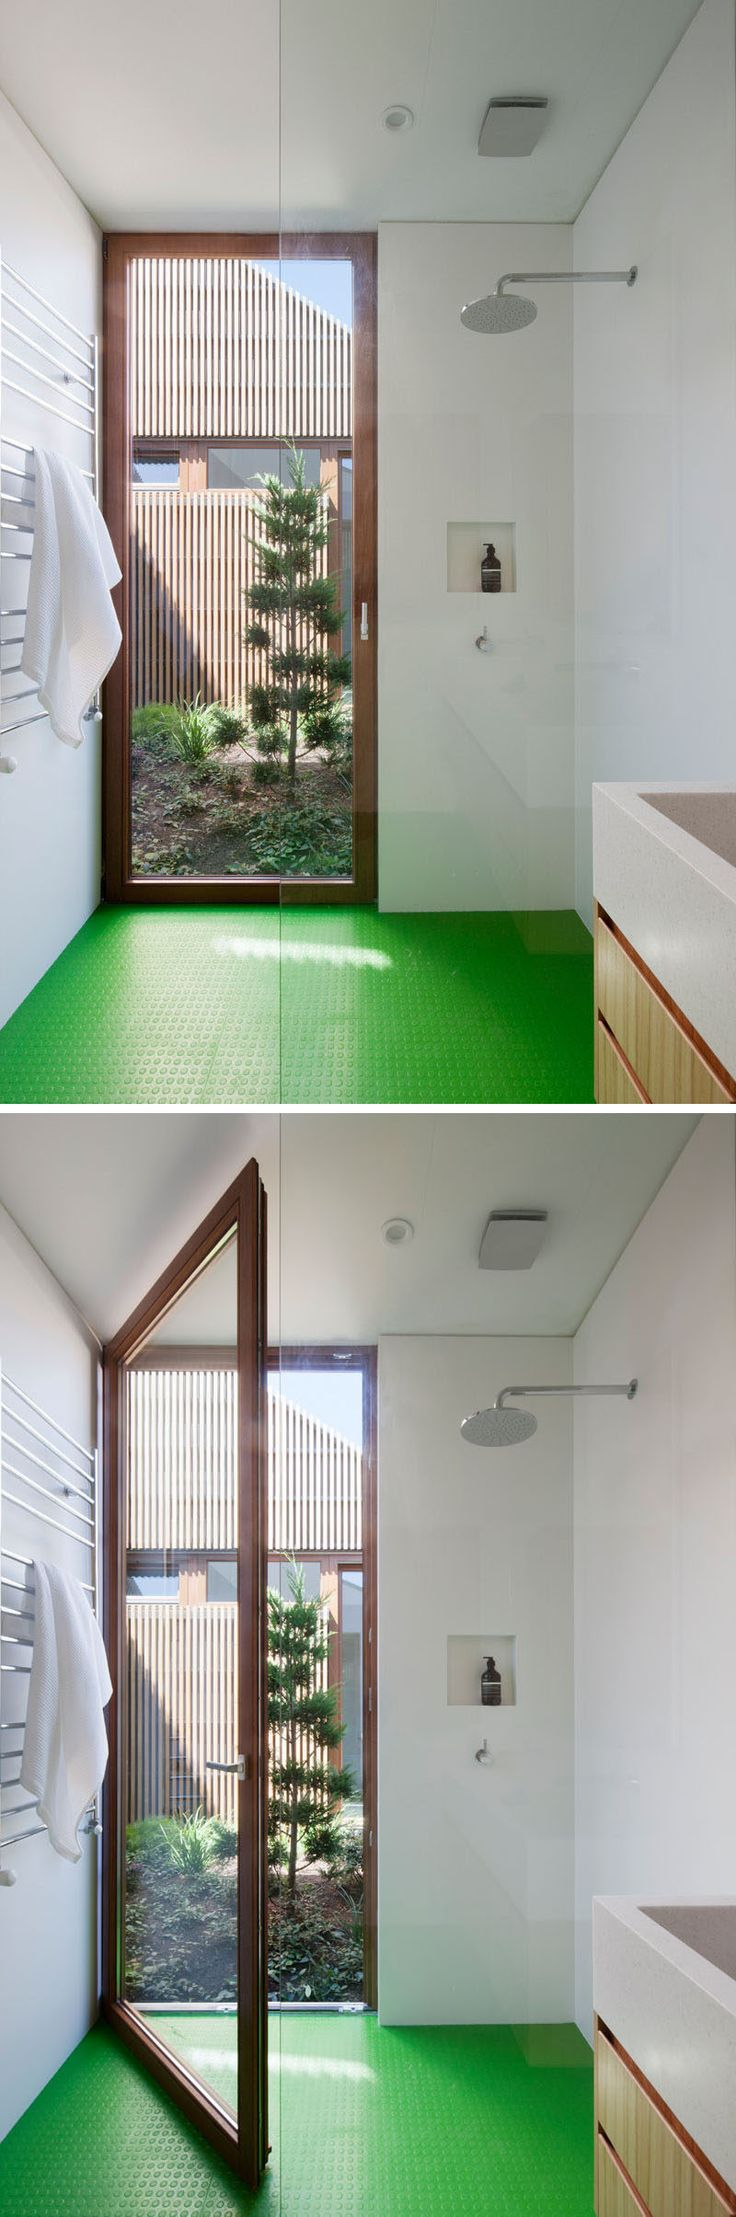 Best 25+ Green modern bathrooms ideas on Pinterest   Contemporary ...